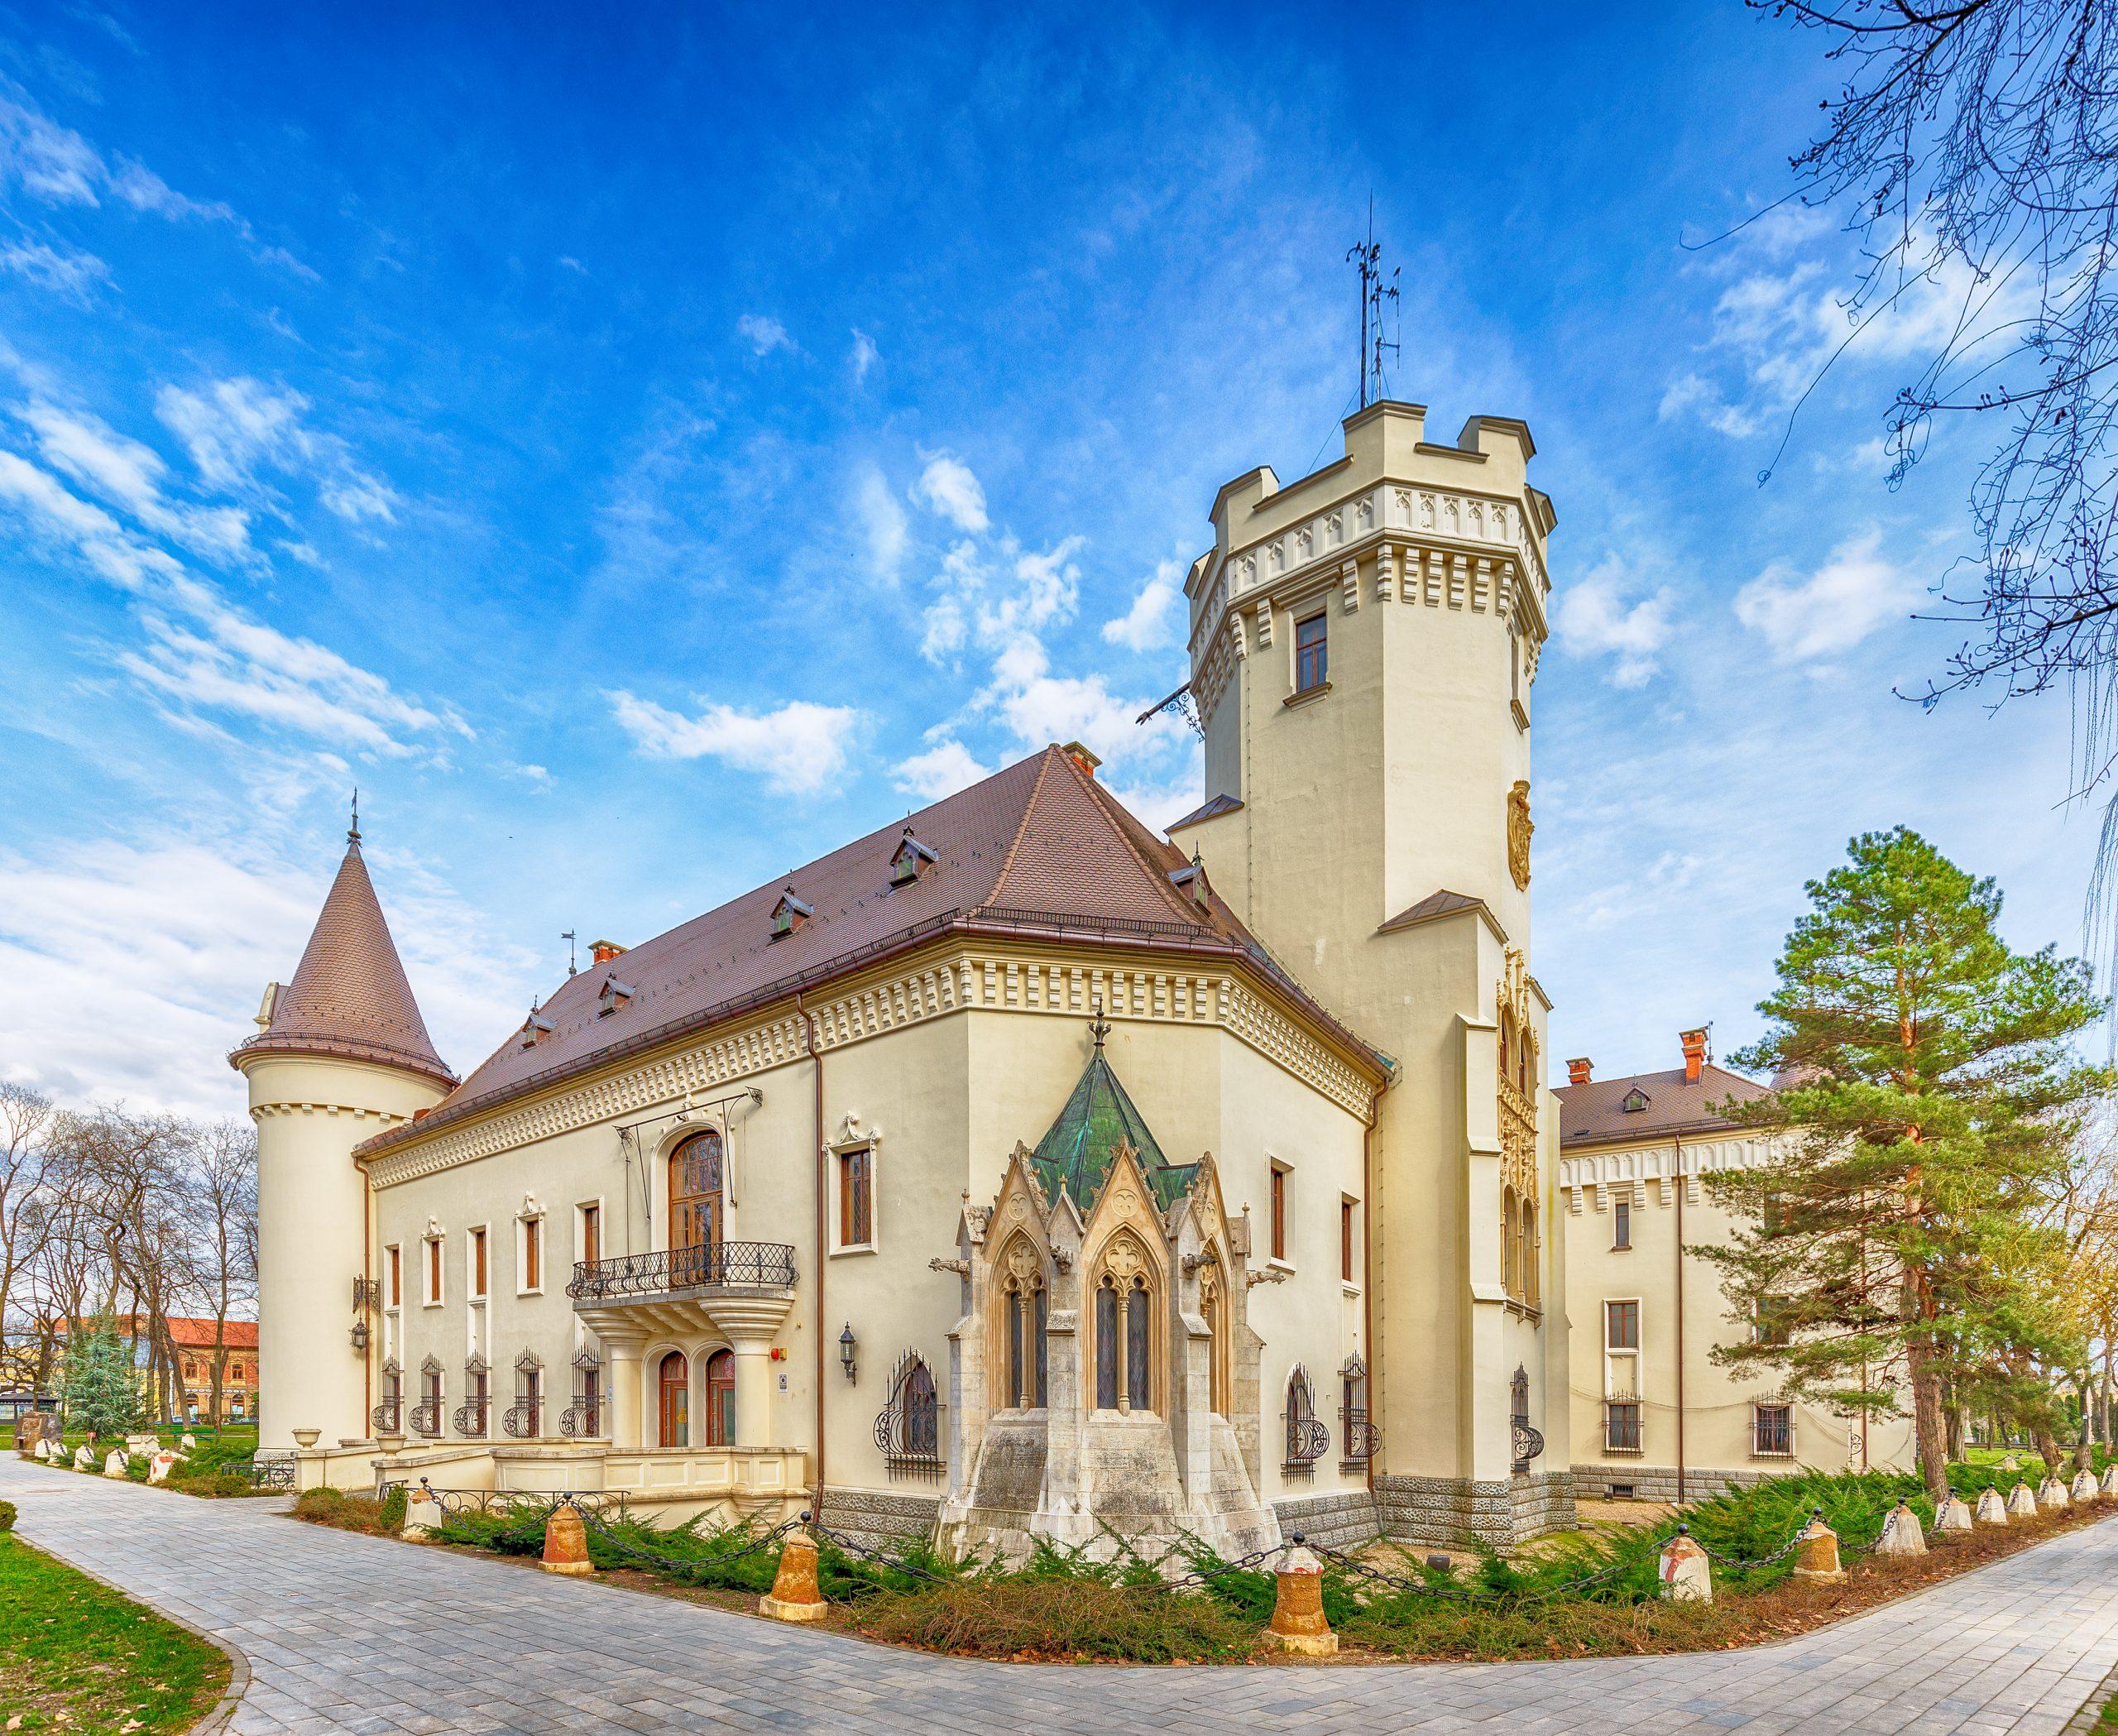 karolyi castle in carei AZ9LBMH 2 scaled